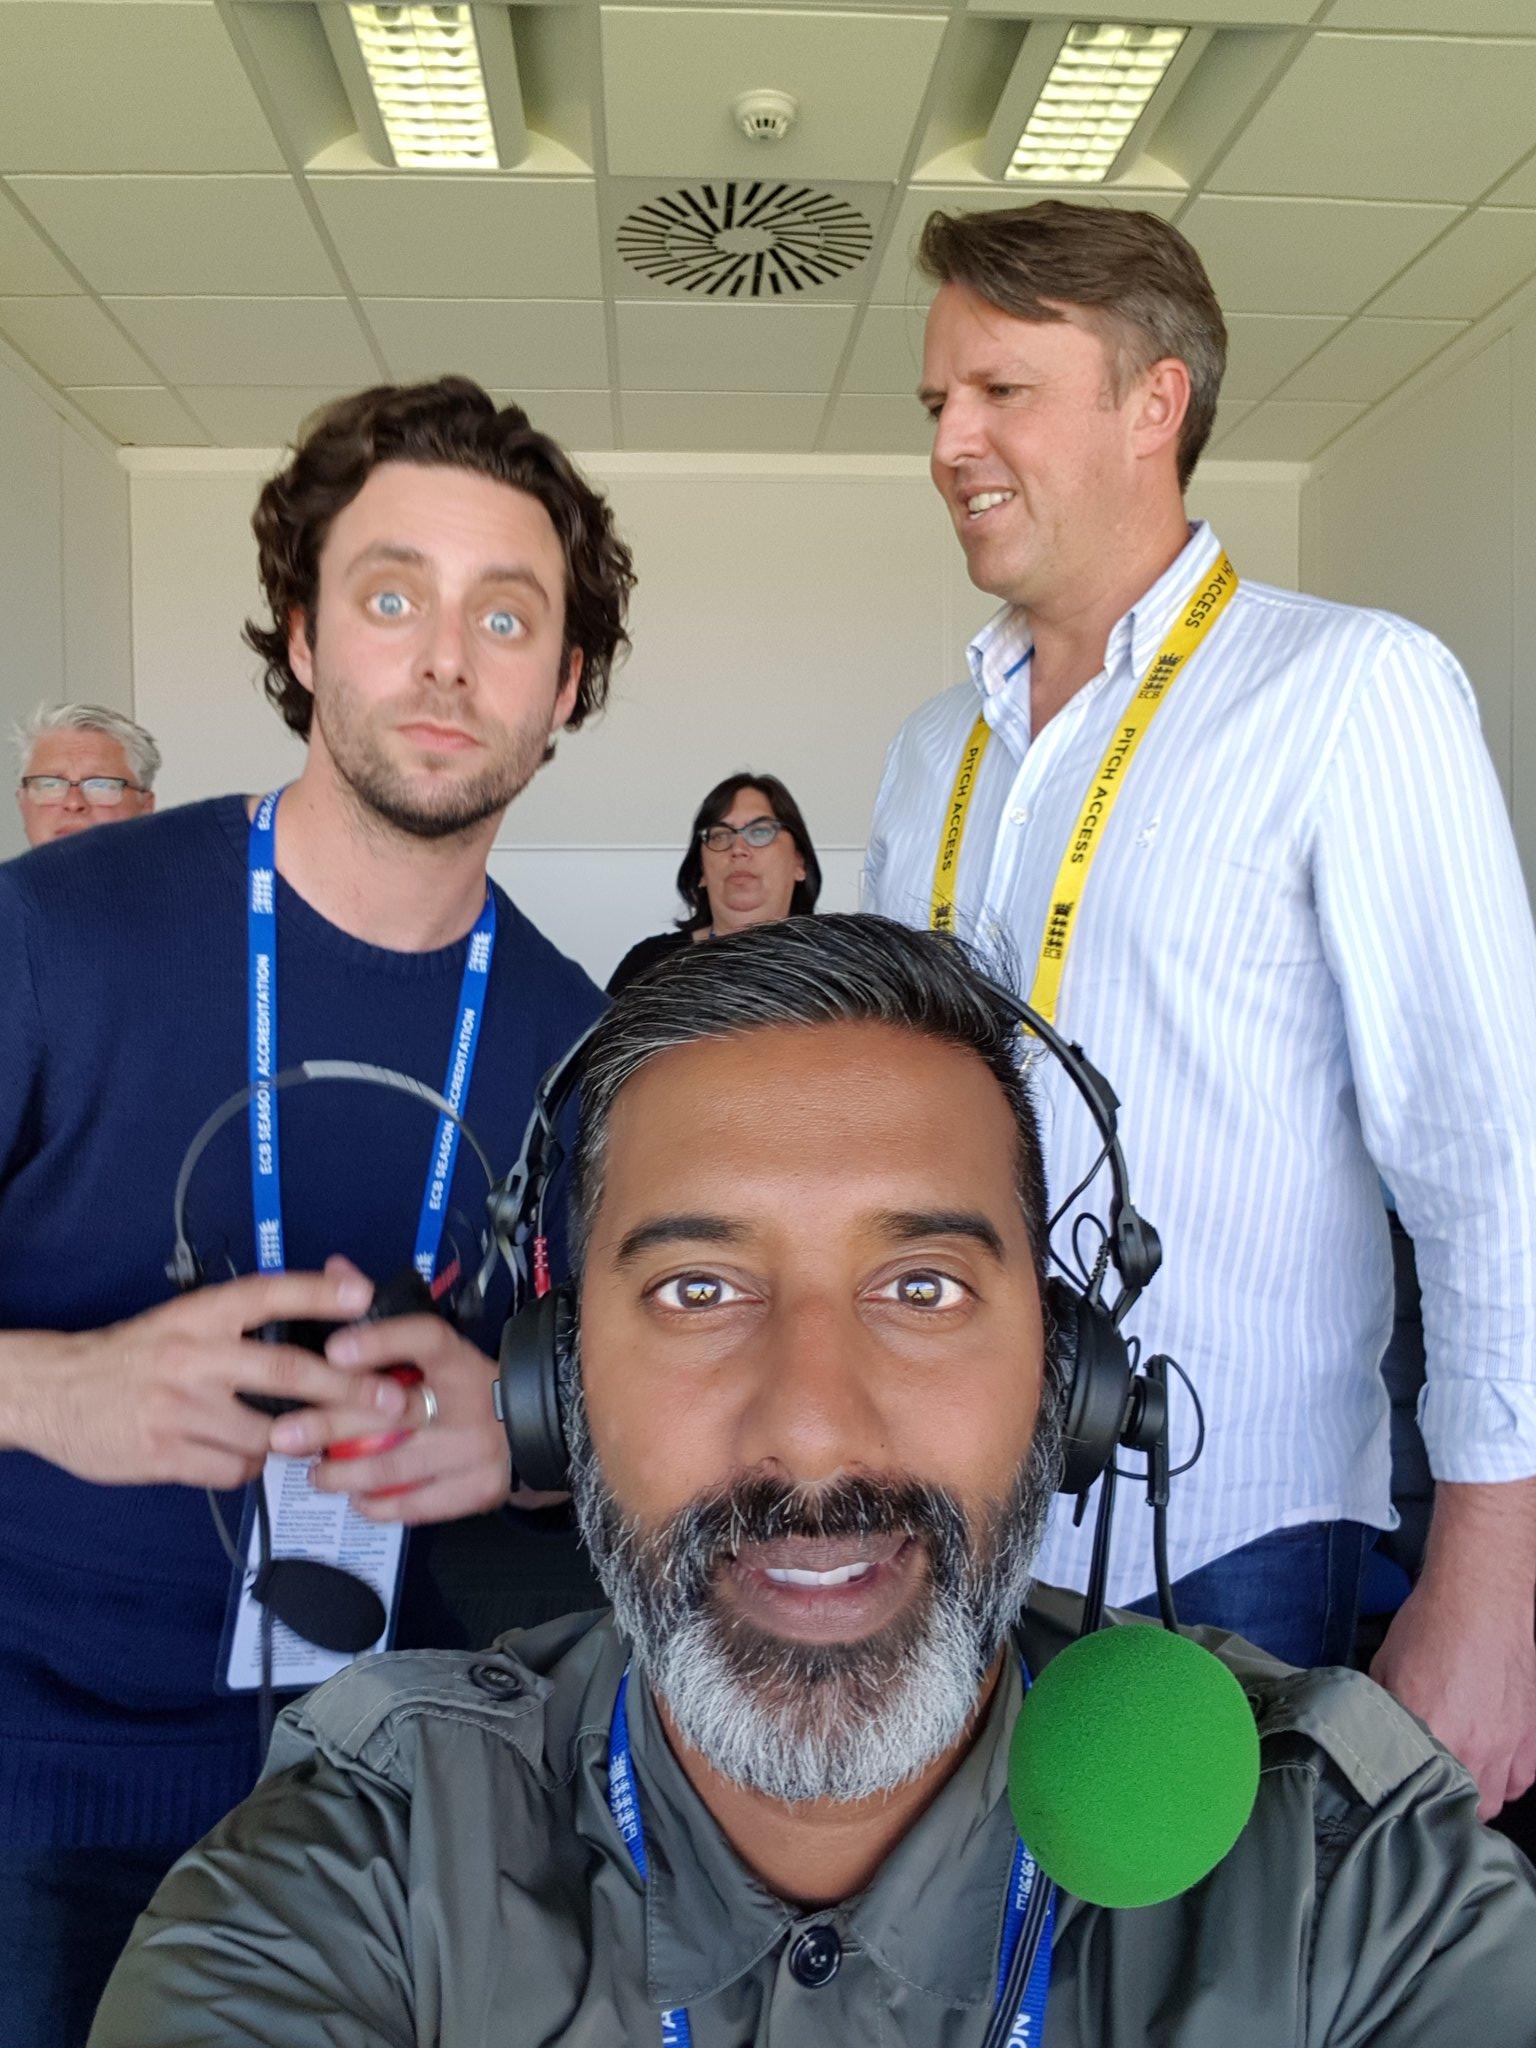 Here we go! @bbc5live @felixwhite @Swannyg66 England vs the West Indies on @bbc5live https://t.co/E08aMYXdur